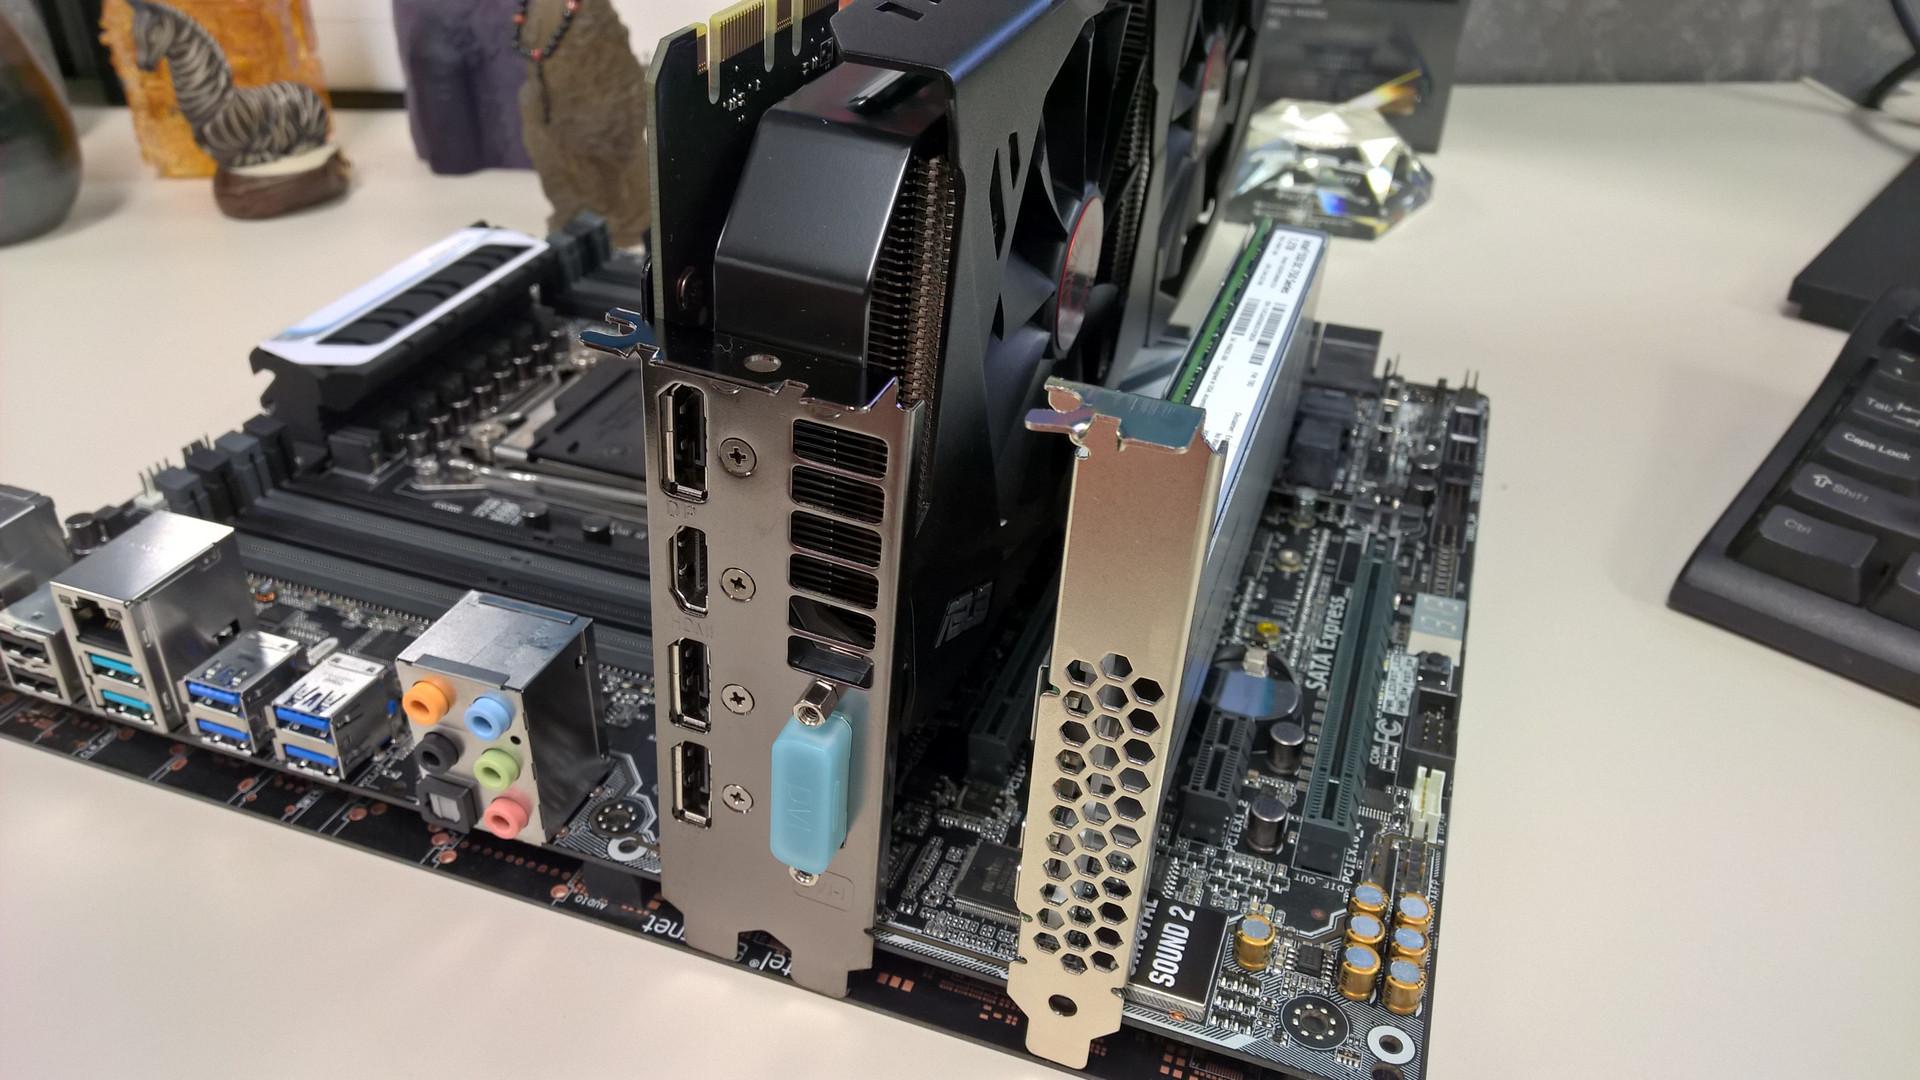 ASUS Z97 & X99 Motherboards & Intel 750 series NVMe SSDs